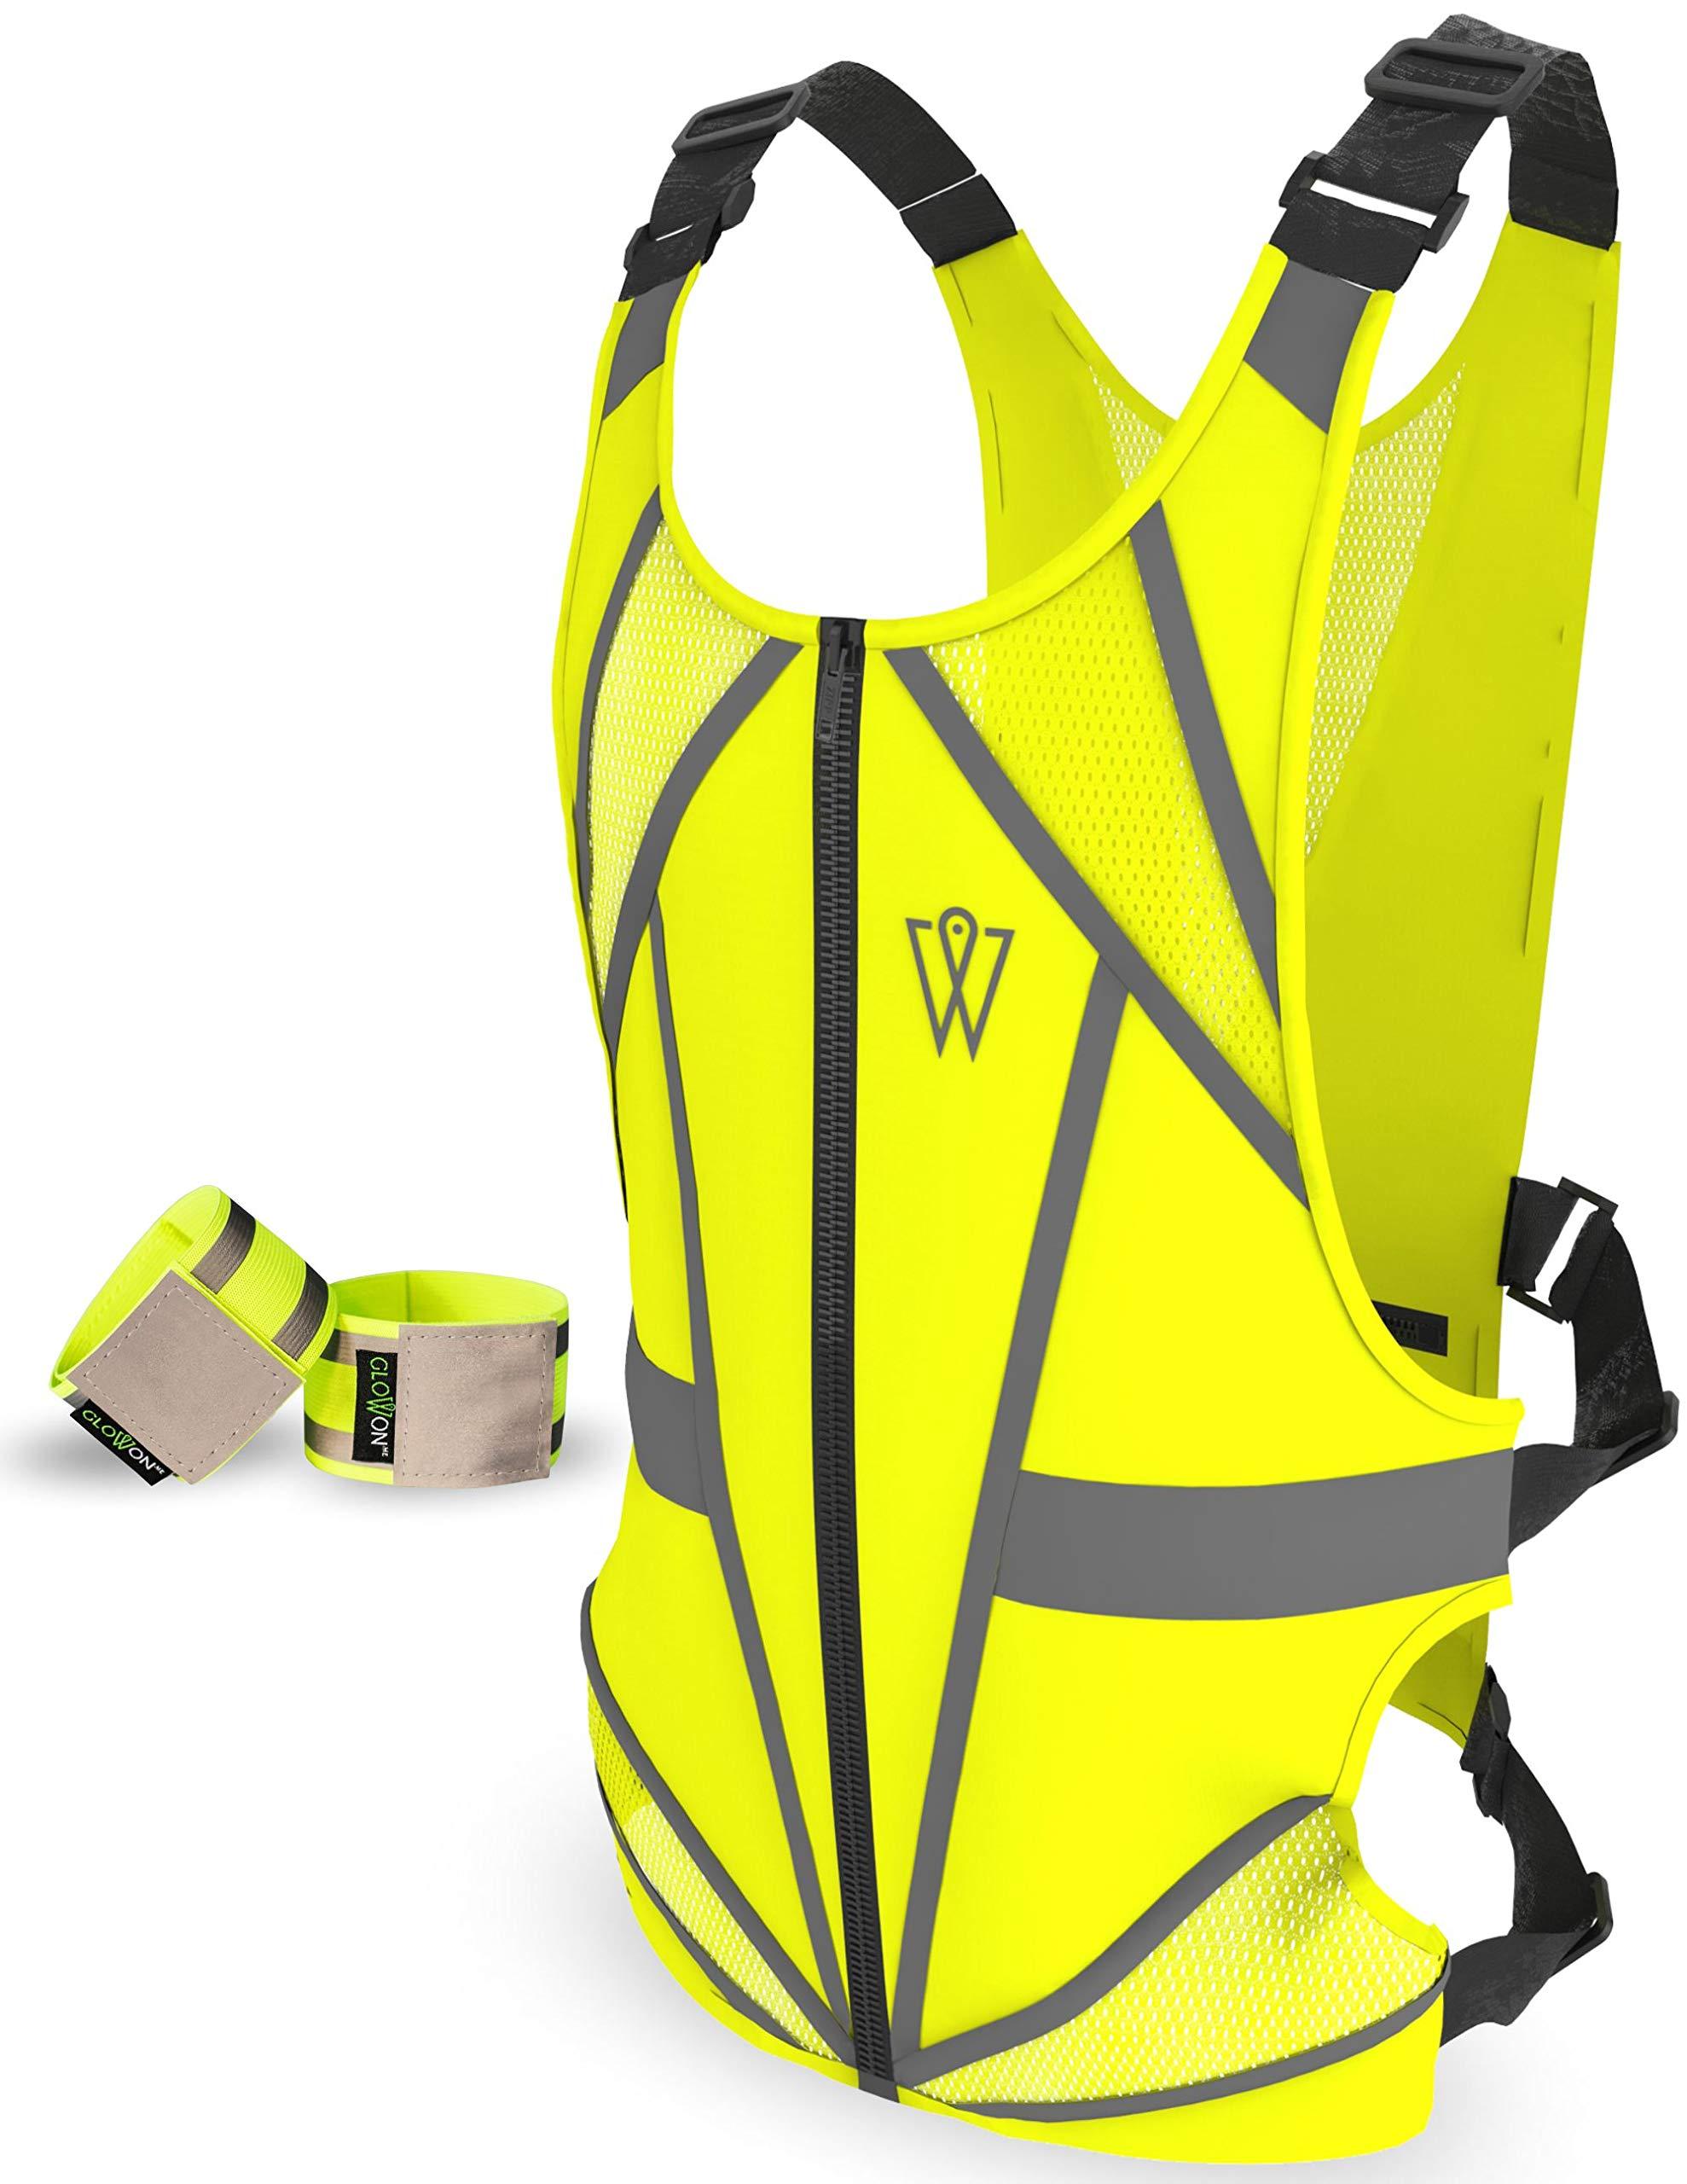 W Reflective Running Vest | Reflective Gear for Running, Cycling, Jogging, Walking, Motorcycle | Adjustable | Front Zipper | Large Back Pocket | Bonus Set of 2 Adjustable Bands | for Men and Women